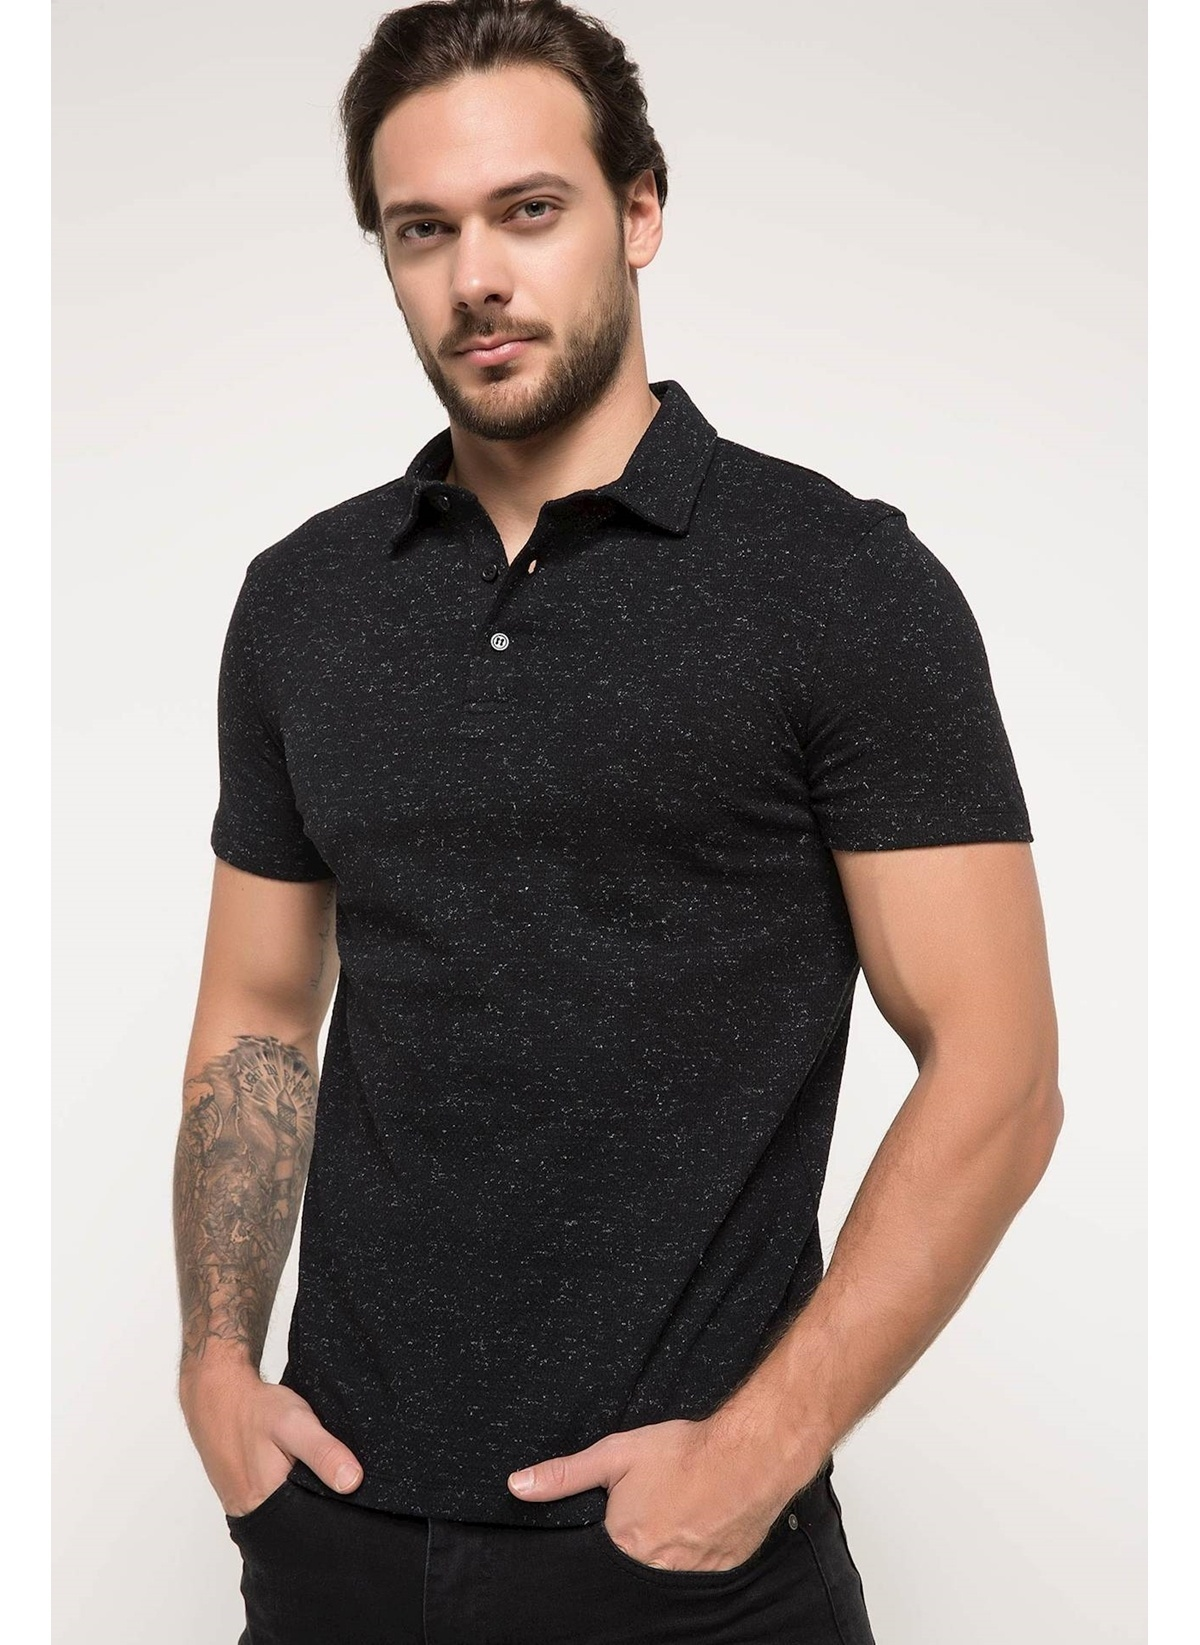 Defacto Basic Polo Yaka T-shirt I3463az18smbk27t-shirt – 29.99 TL